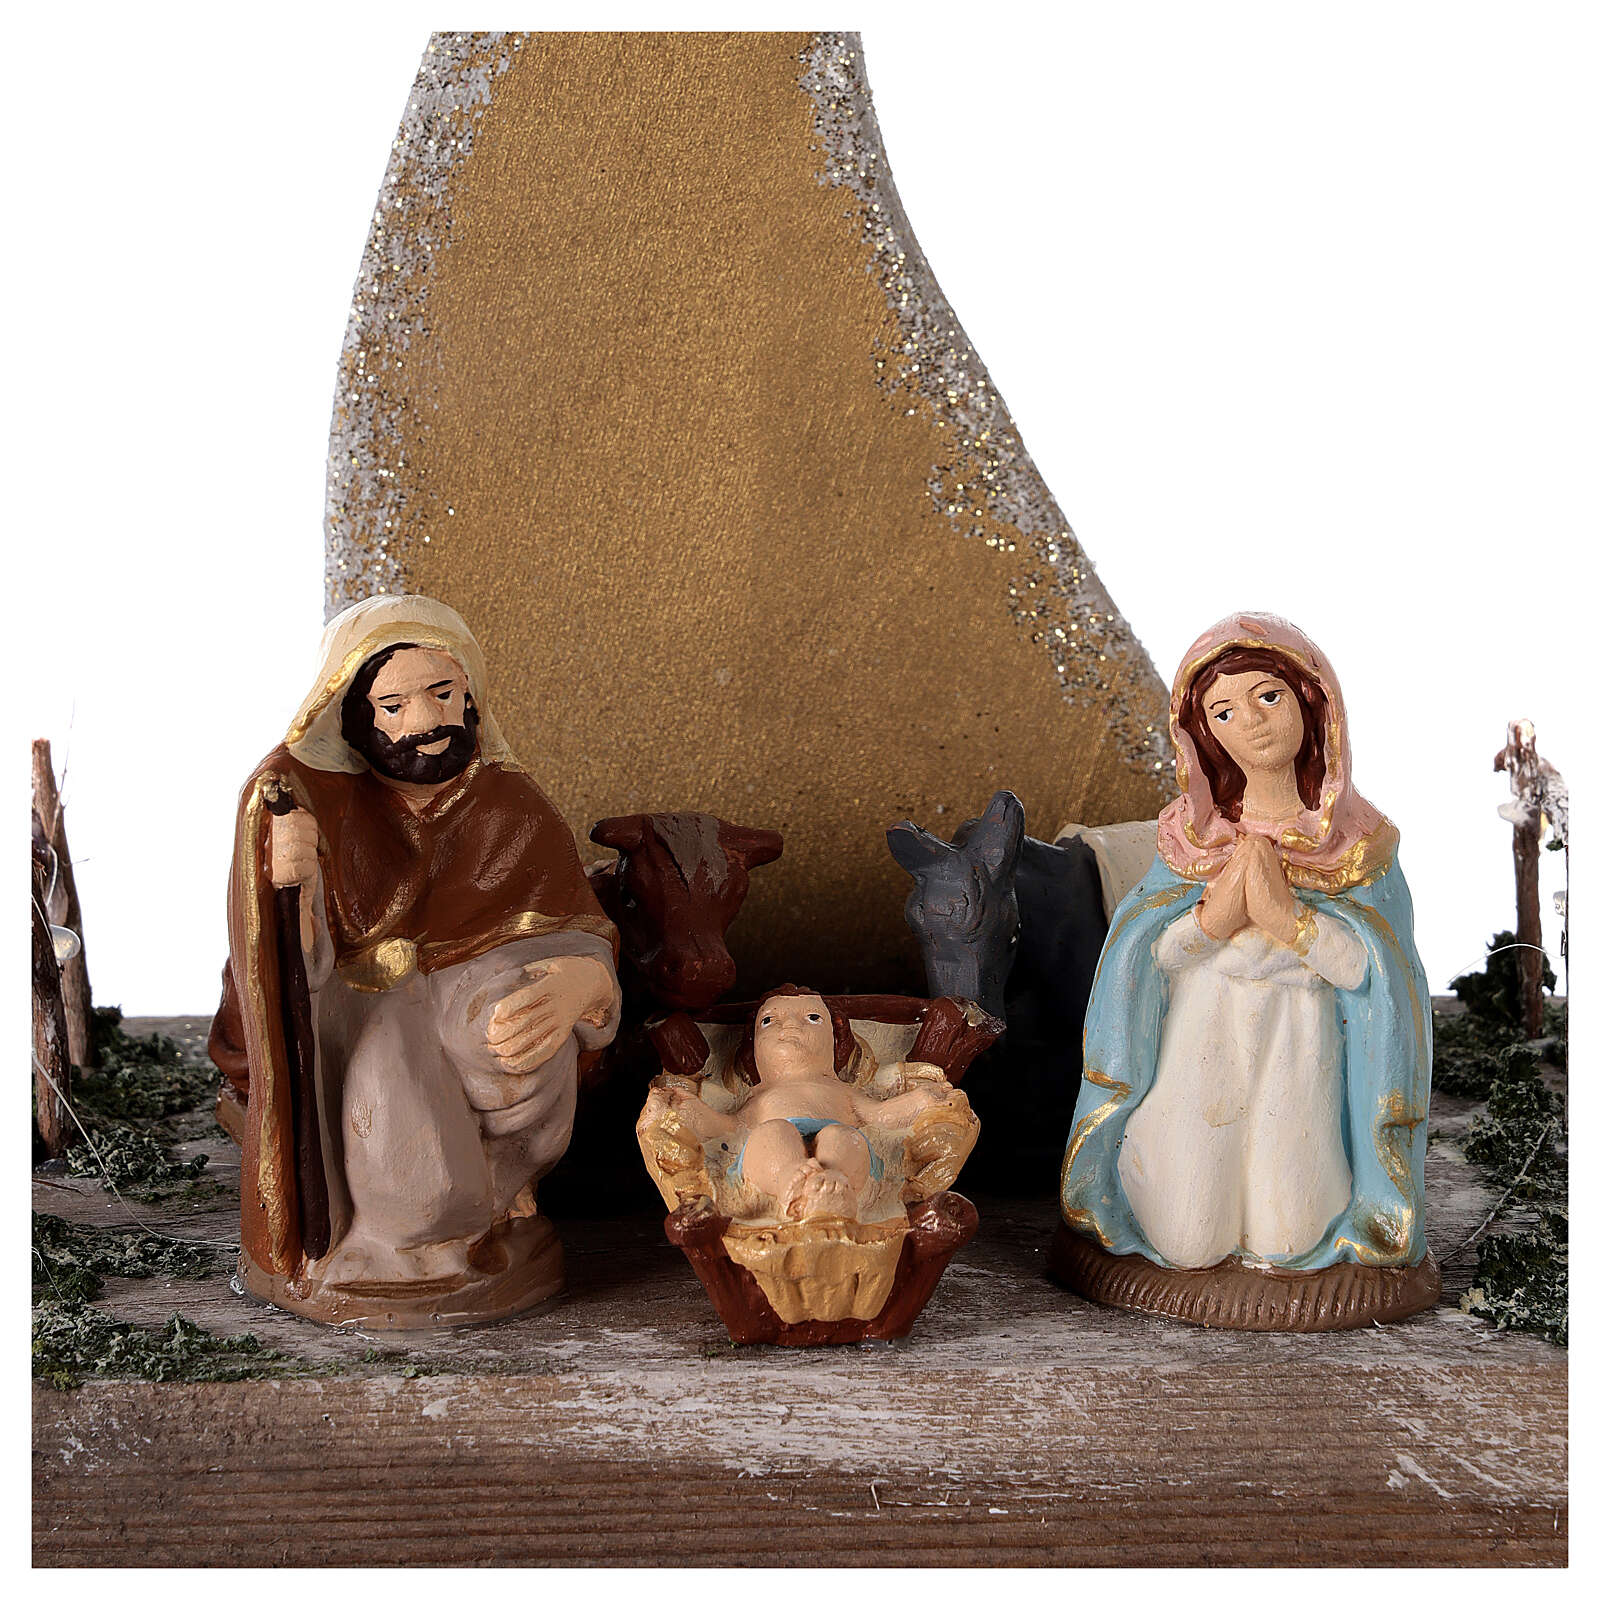 Miniature Nativity 8 cm with golden comet terracotta Deruta 25x20x15 cm 4